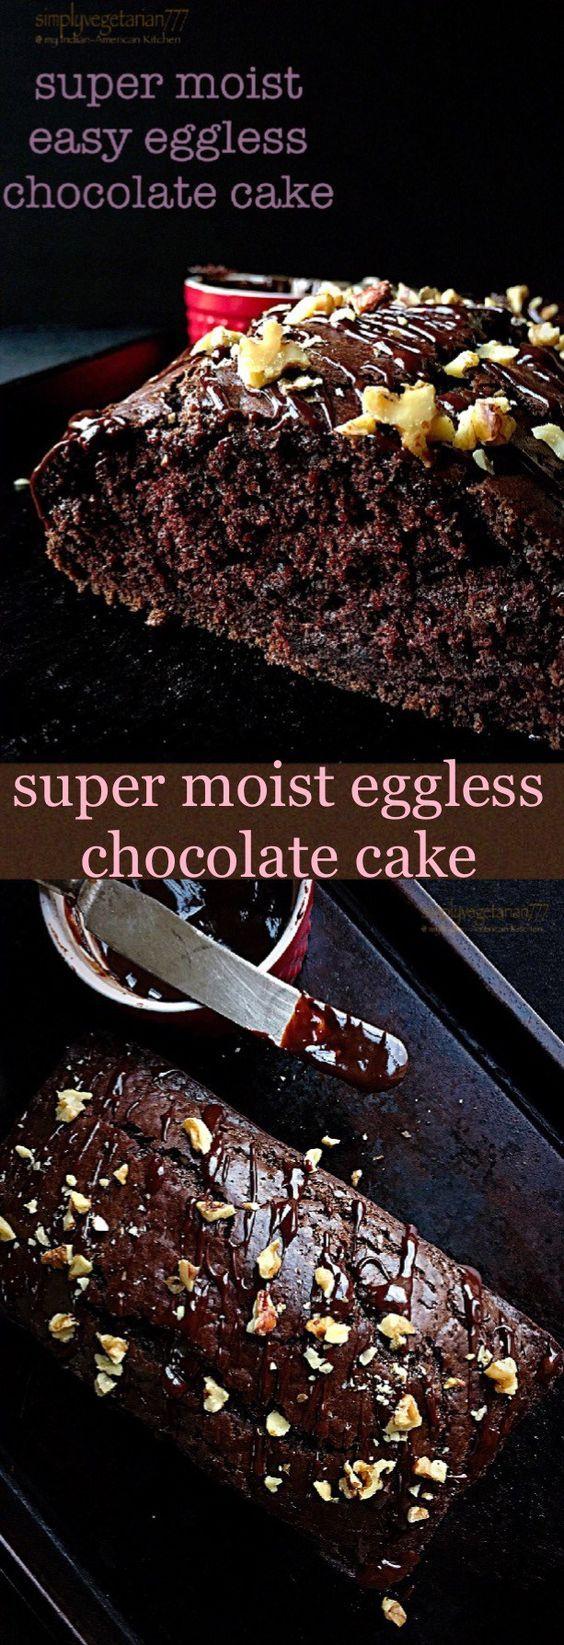 Times of india chocolate cake recipe